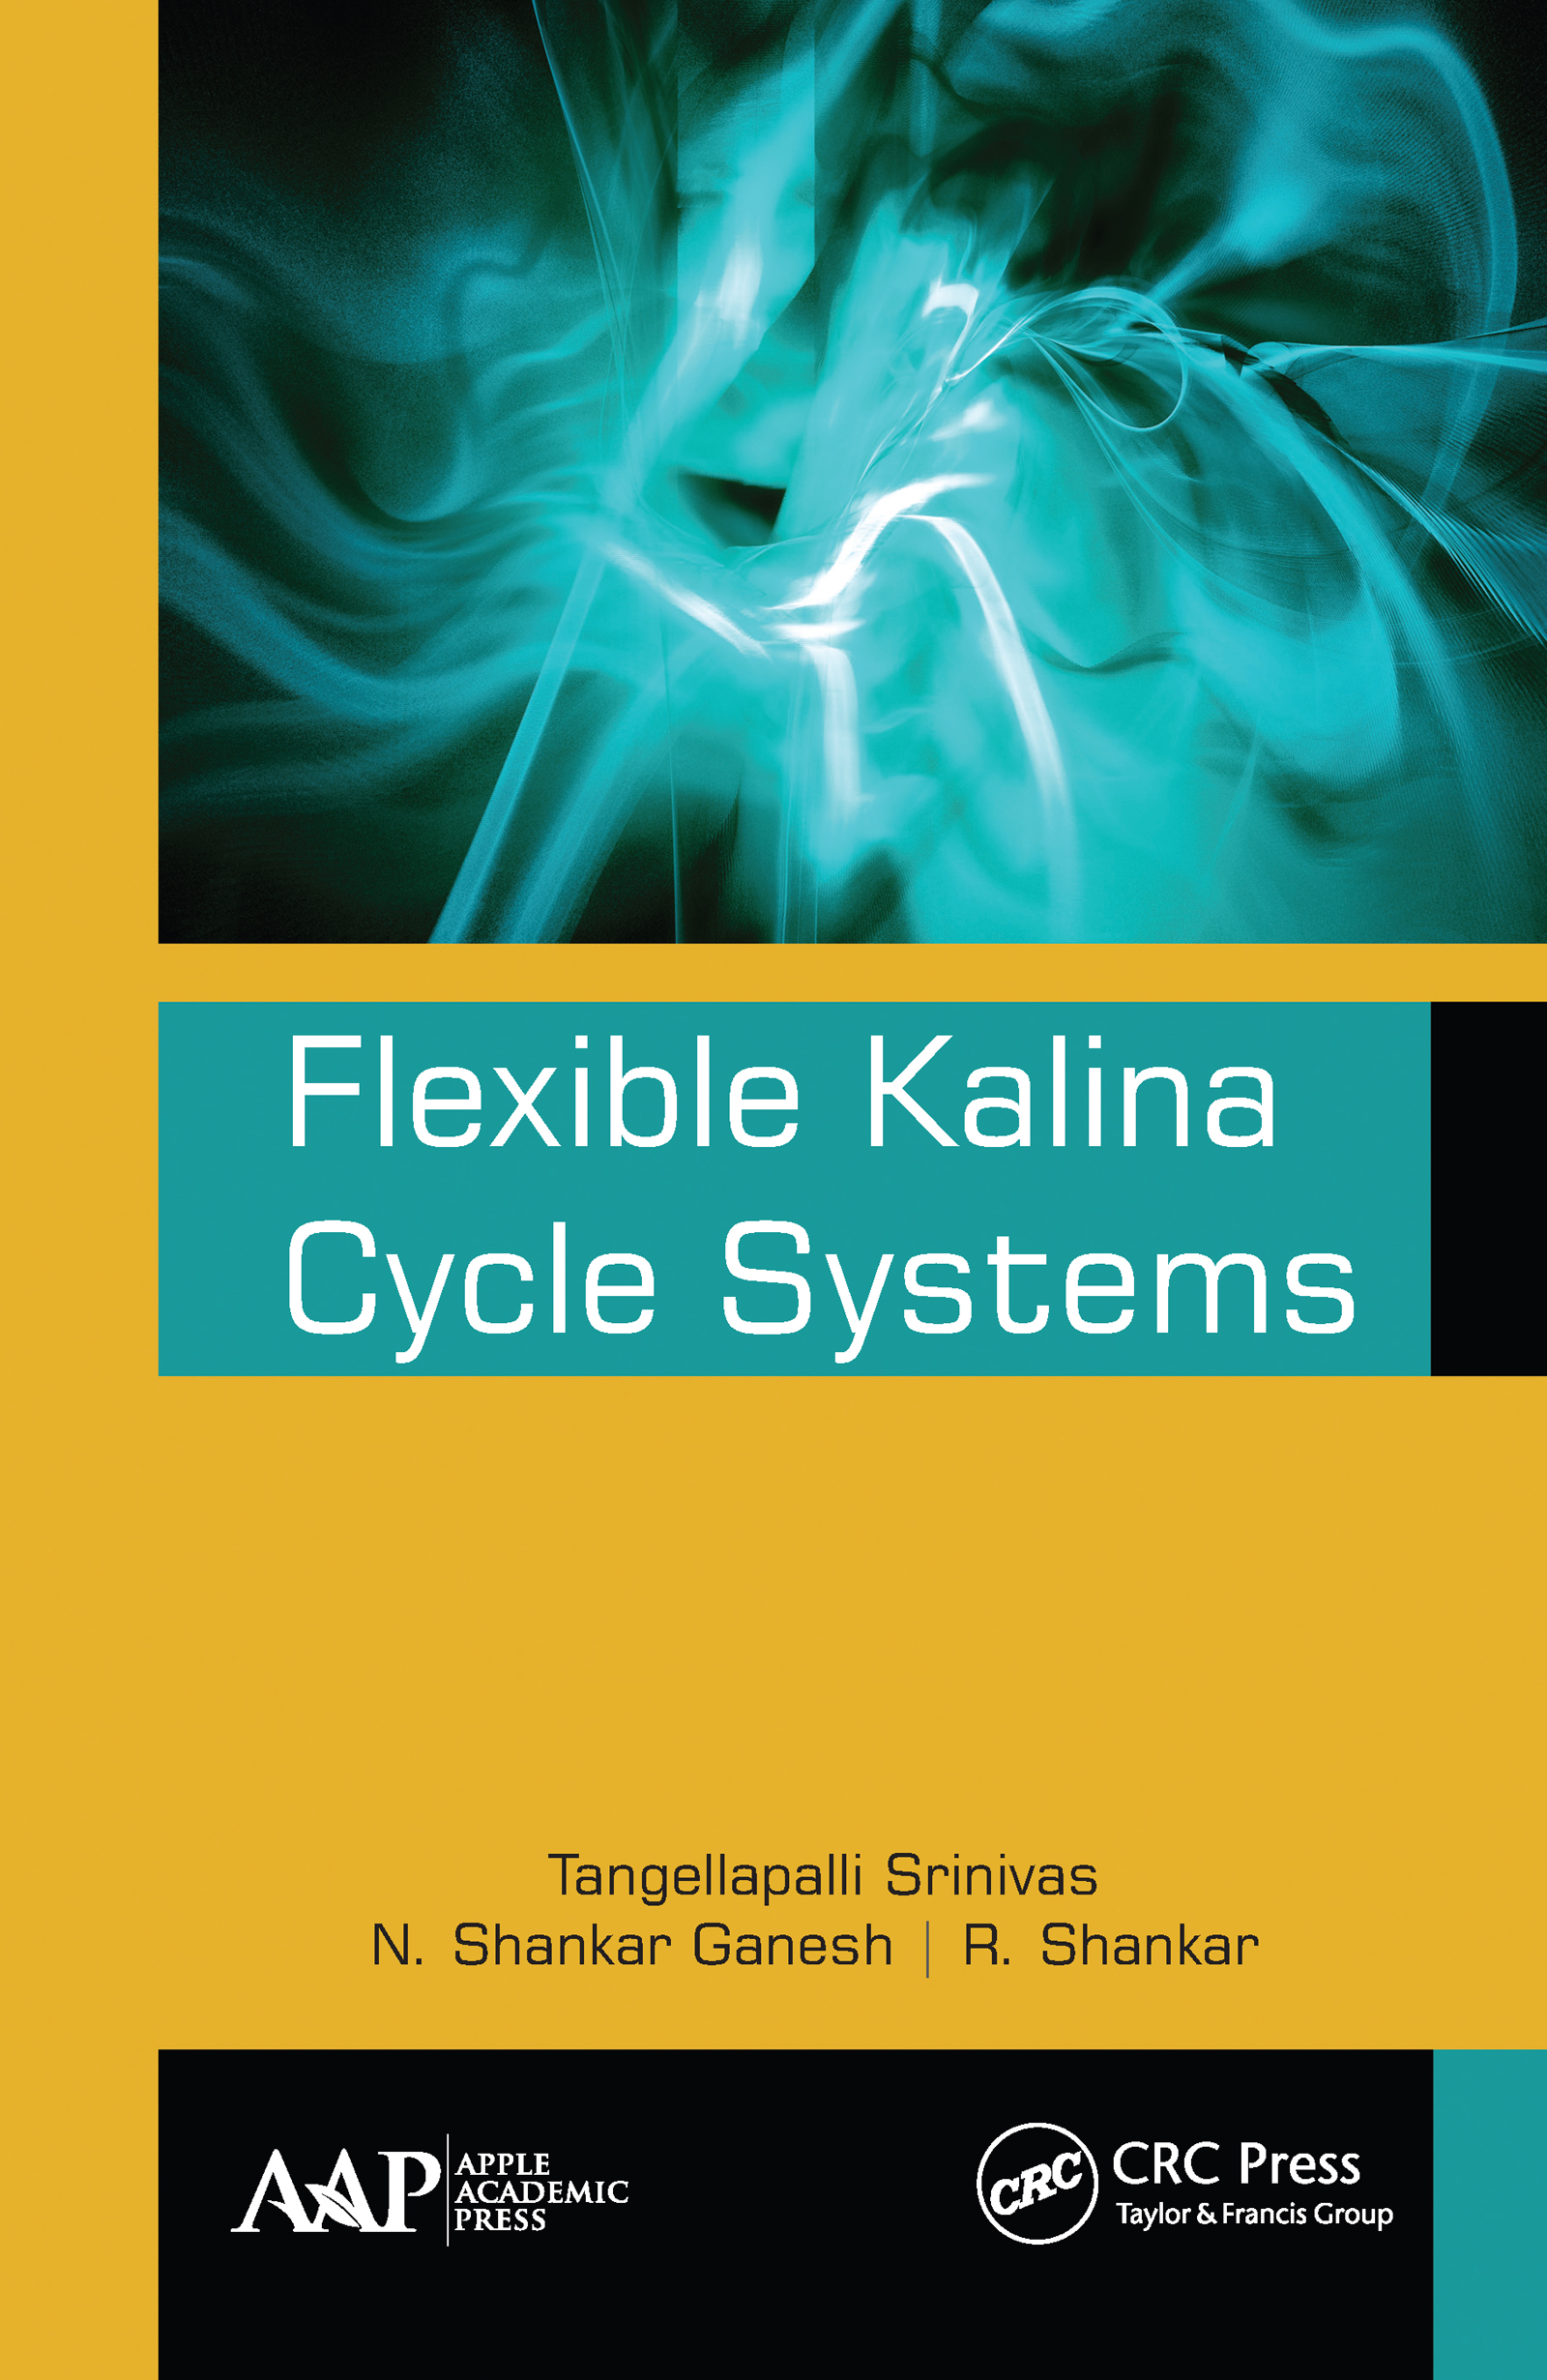 Flexible Kalina Cycle Systems